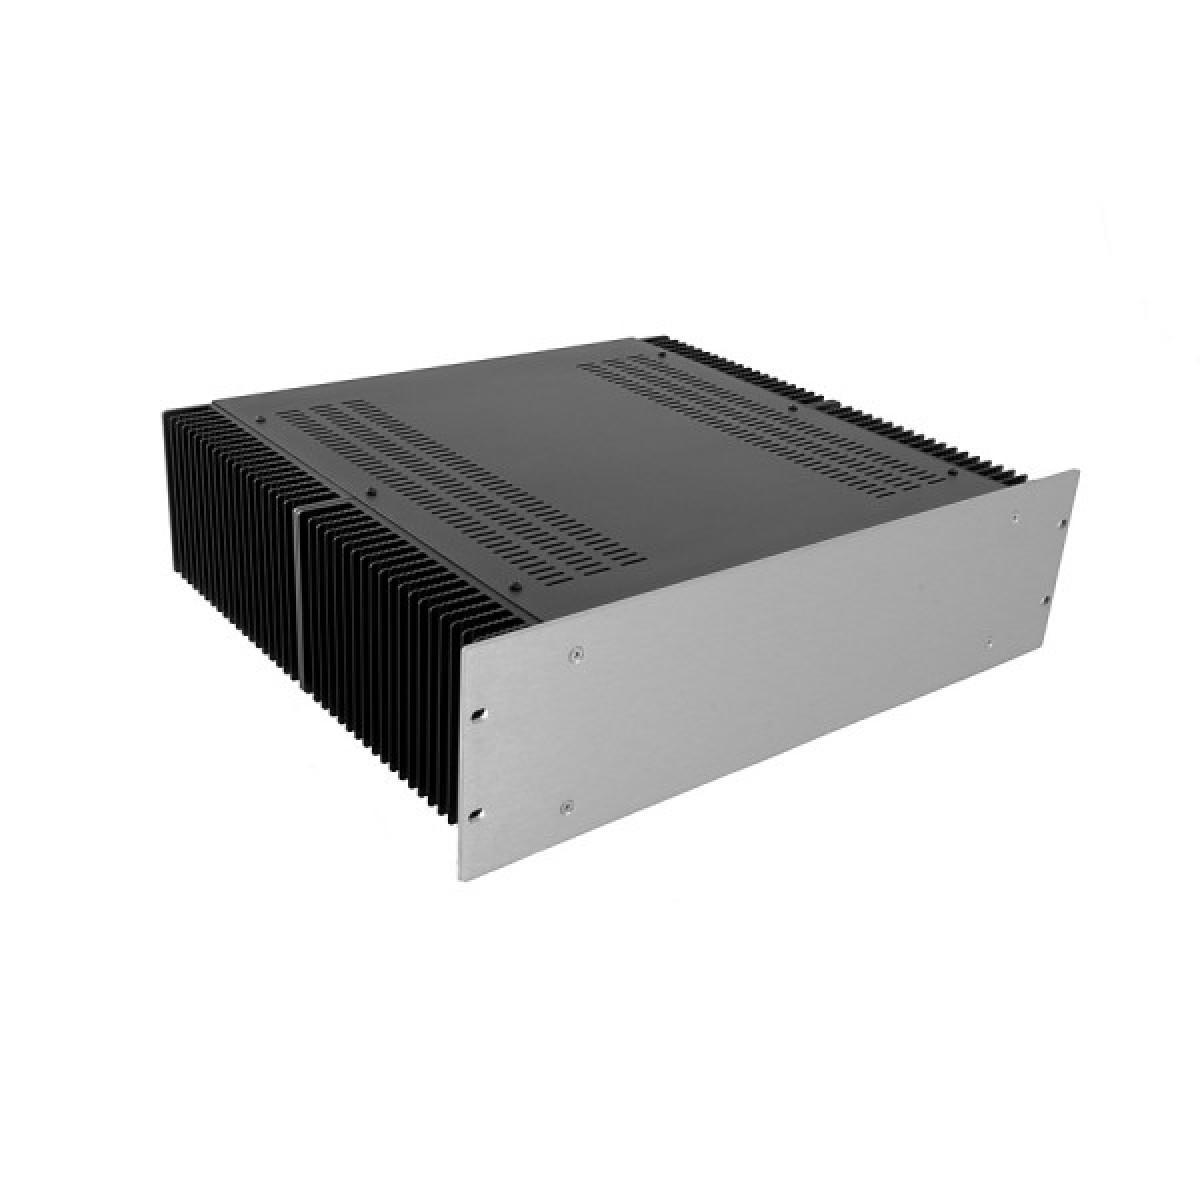 FirstWatt. Cajas y disipadores DSC_8144-600x600-1200x1200